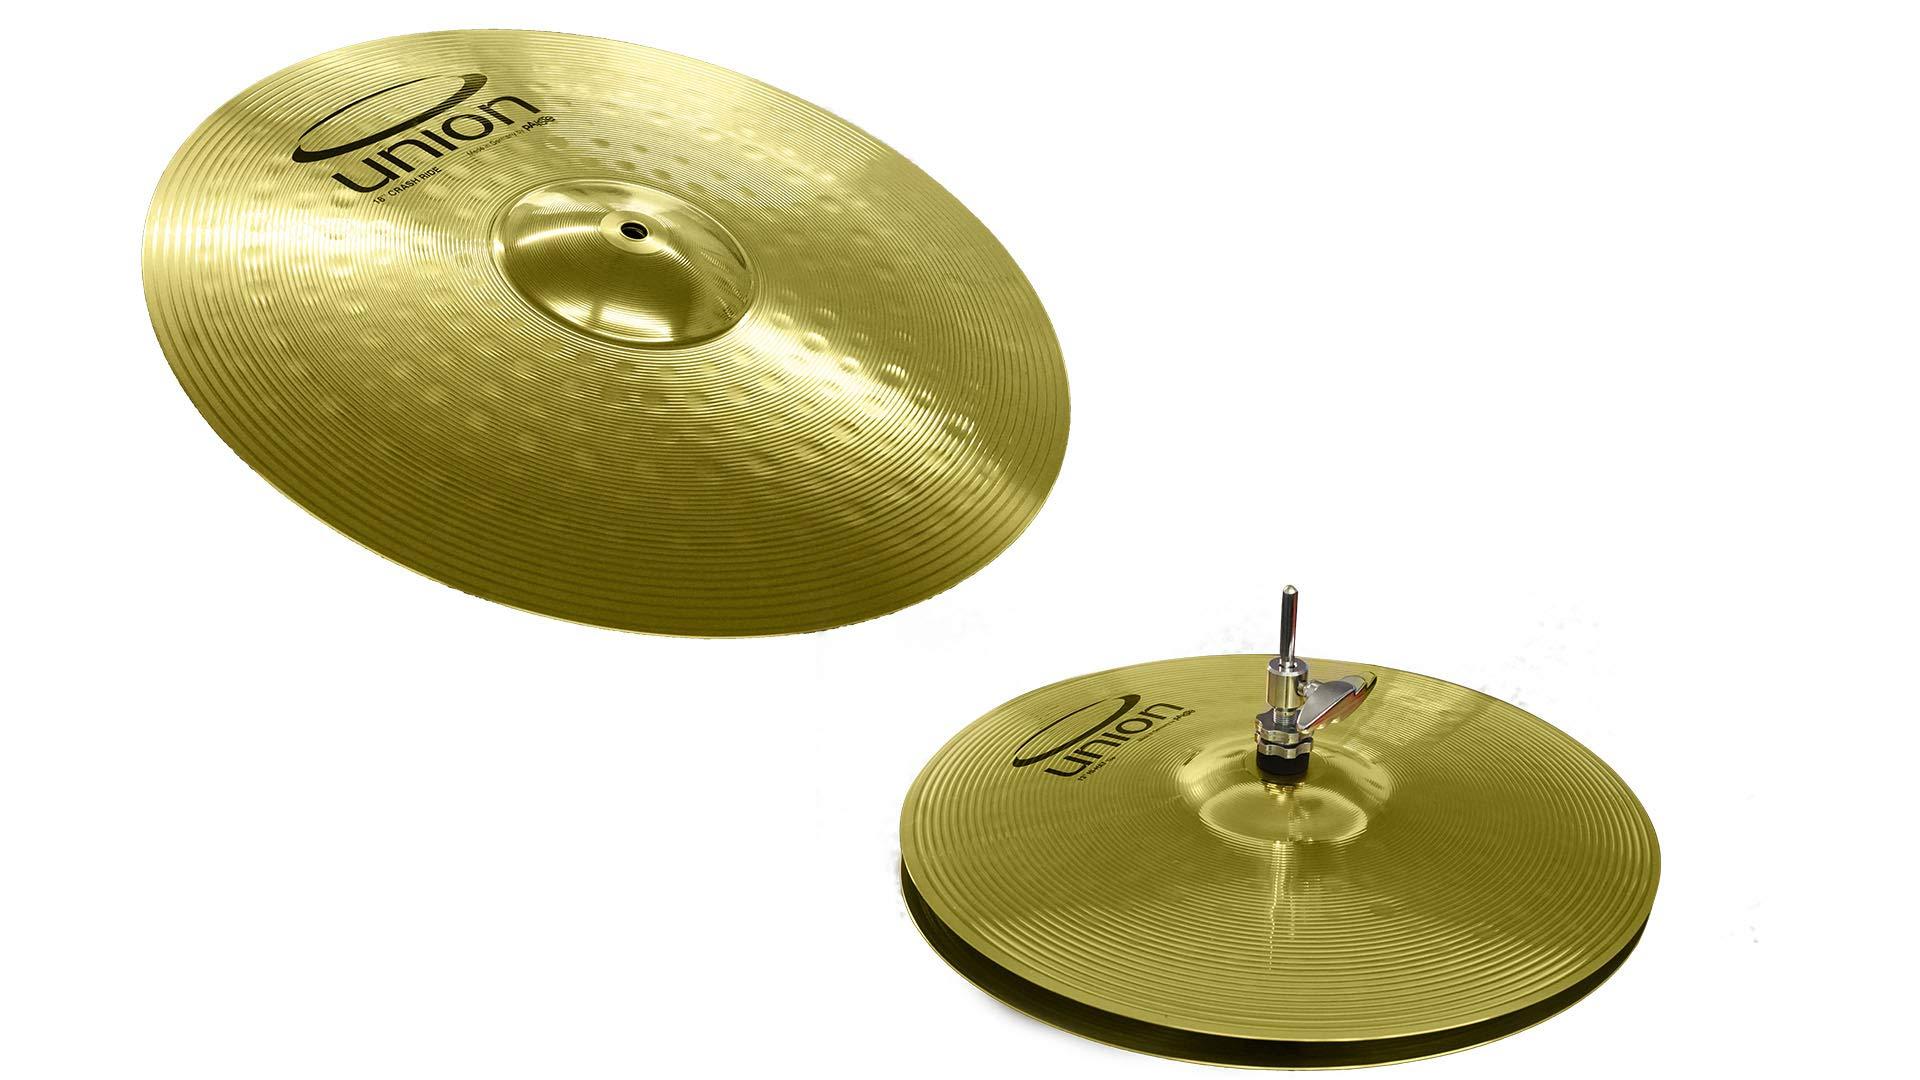 Union by Paiste 3-Piece Brass Cymbal Set 13 inch Hi-Hats/18 inch Crash-Ride OEMBM1KP by Union